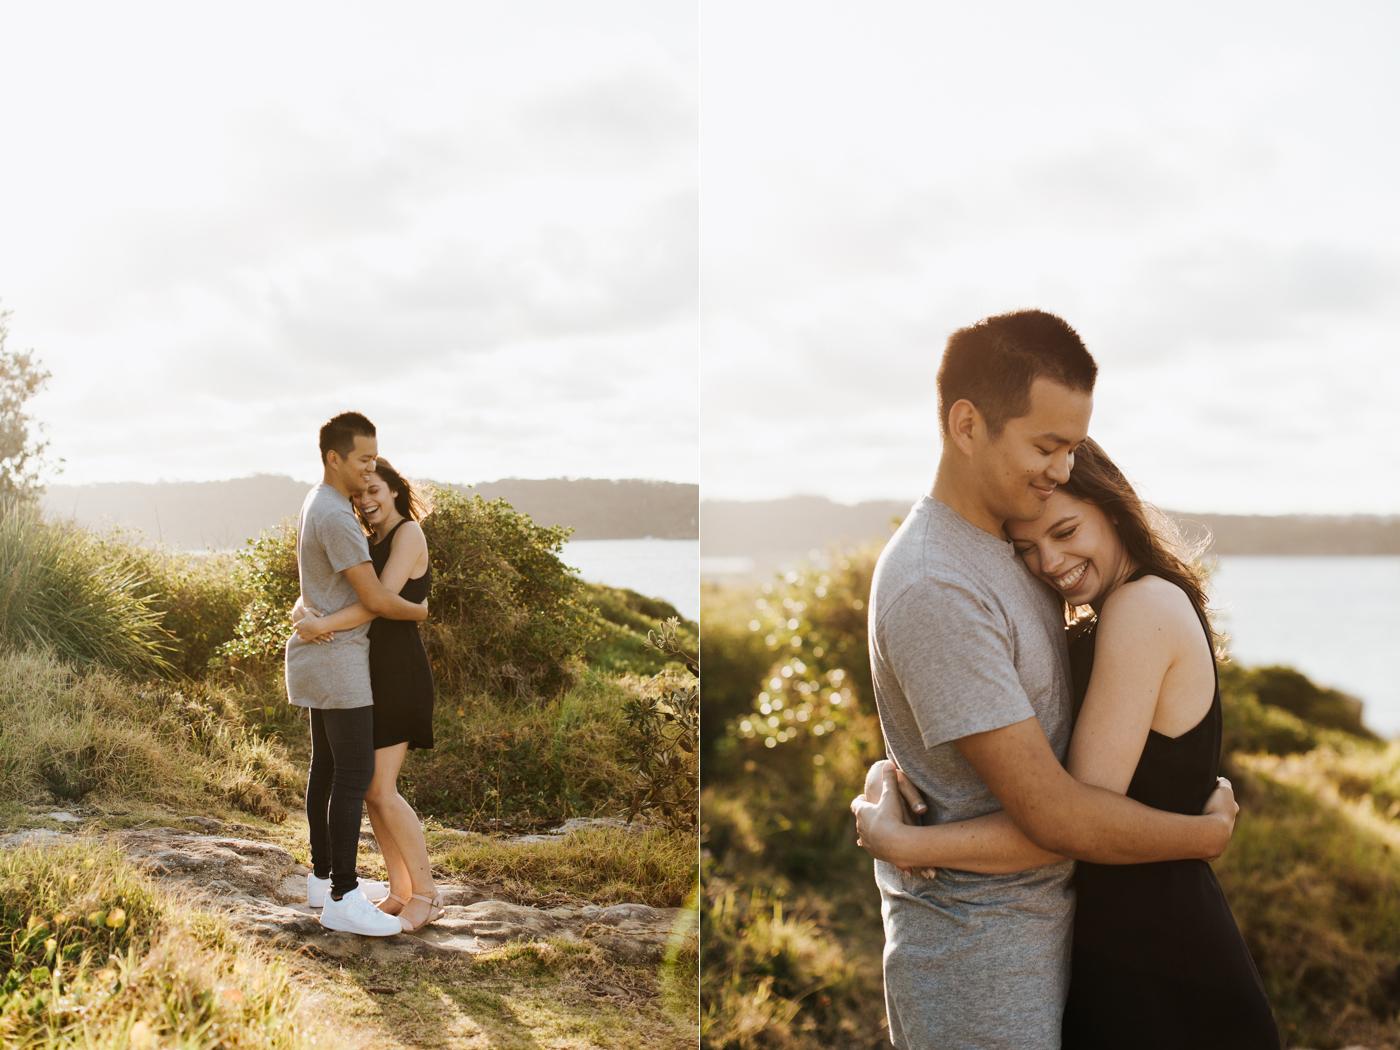 James & Caitie Engagement - Watsons Bay - Samantha Heather Photography-21.jpg